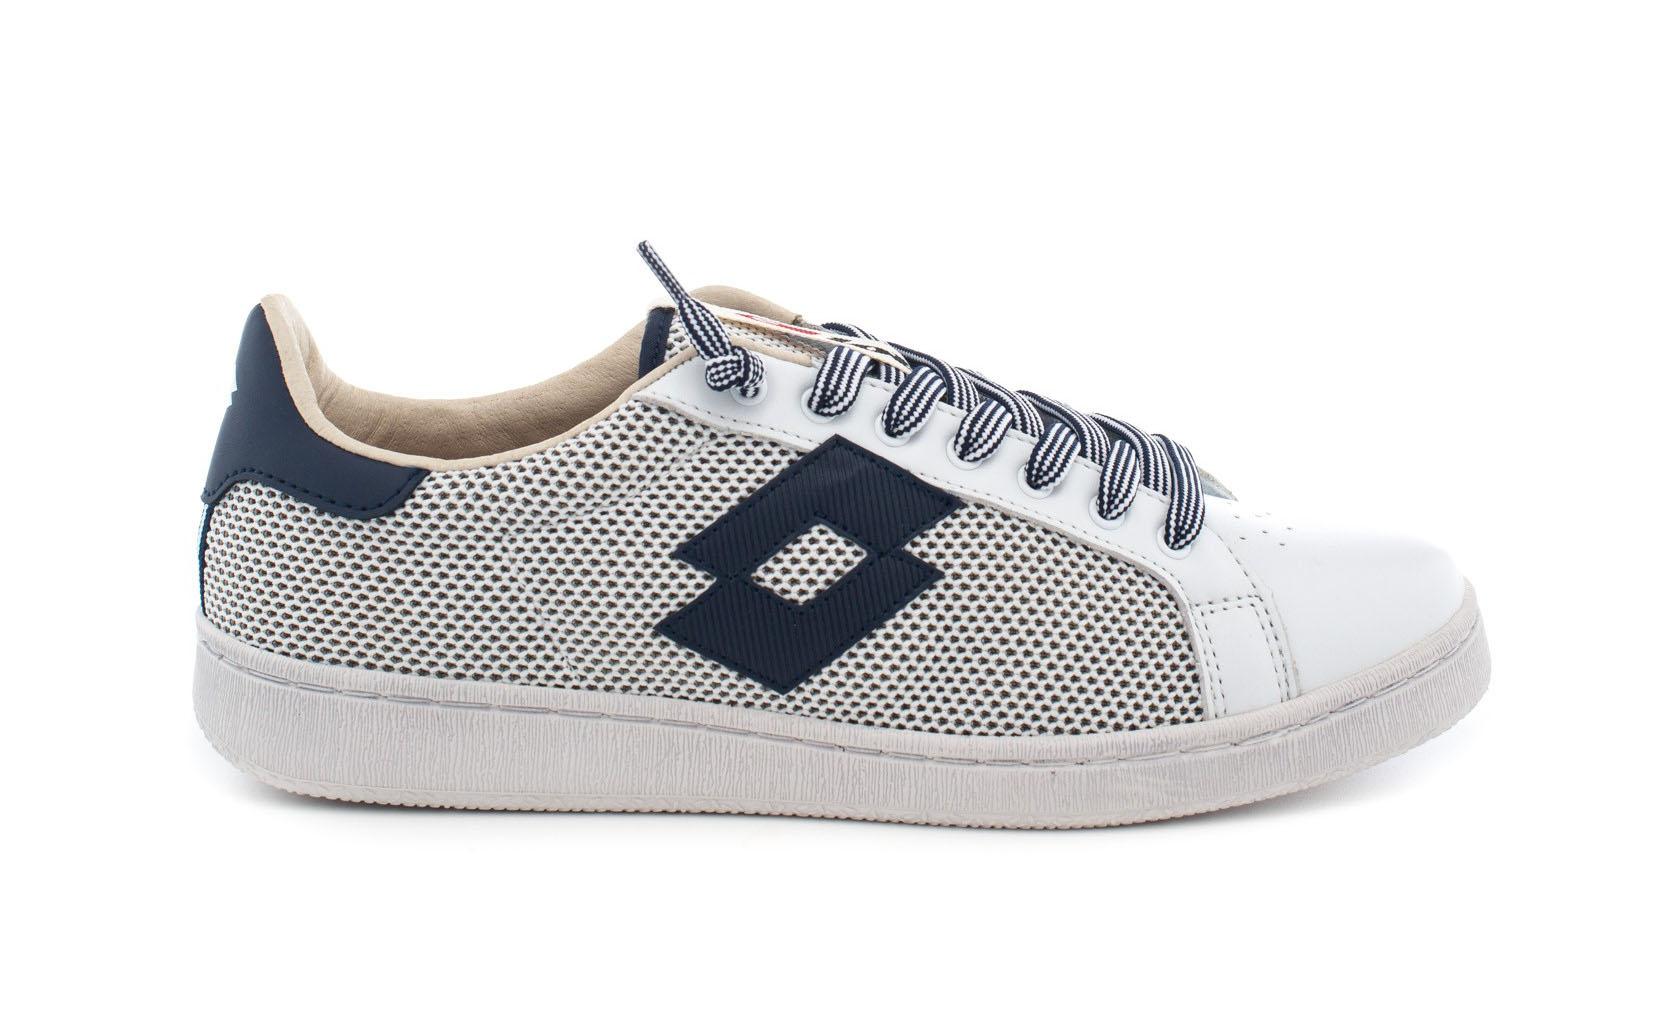 lotto-scarpe-tennis-Prato